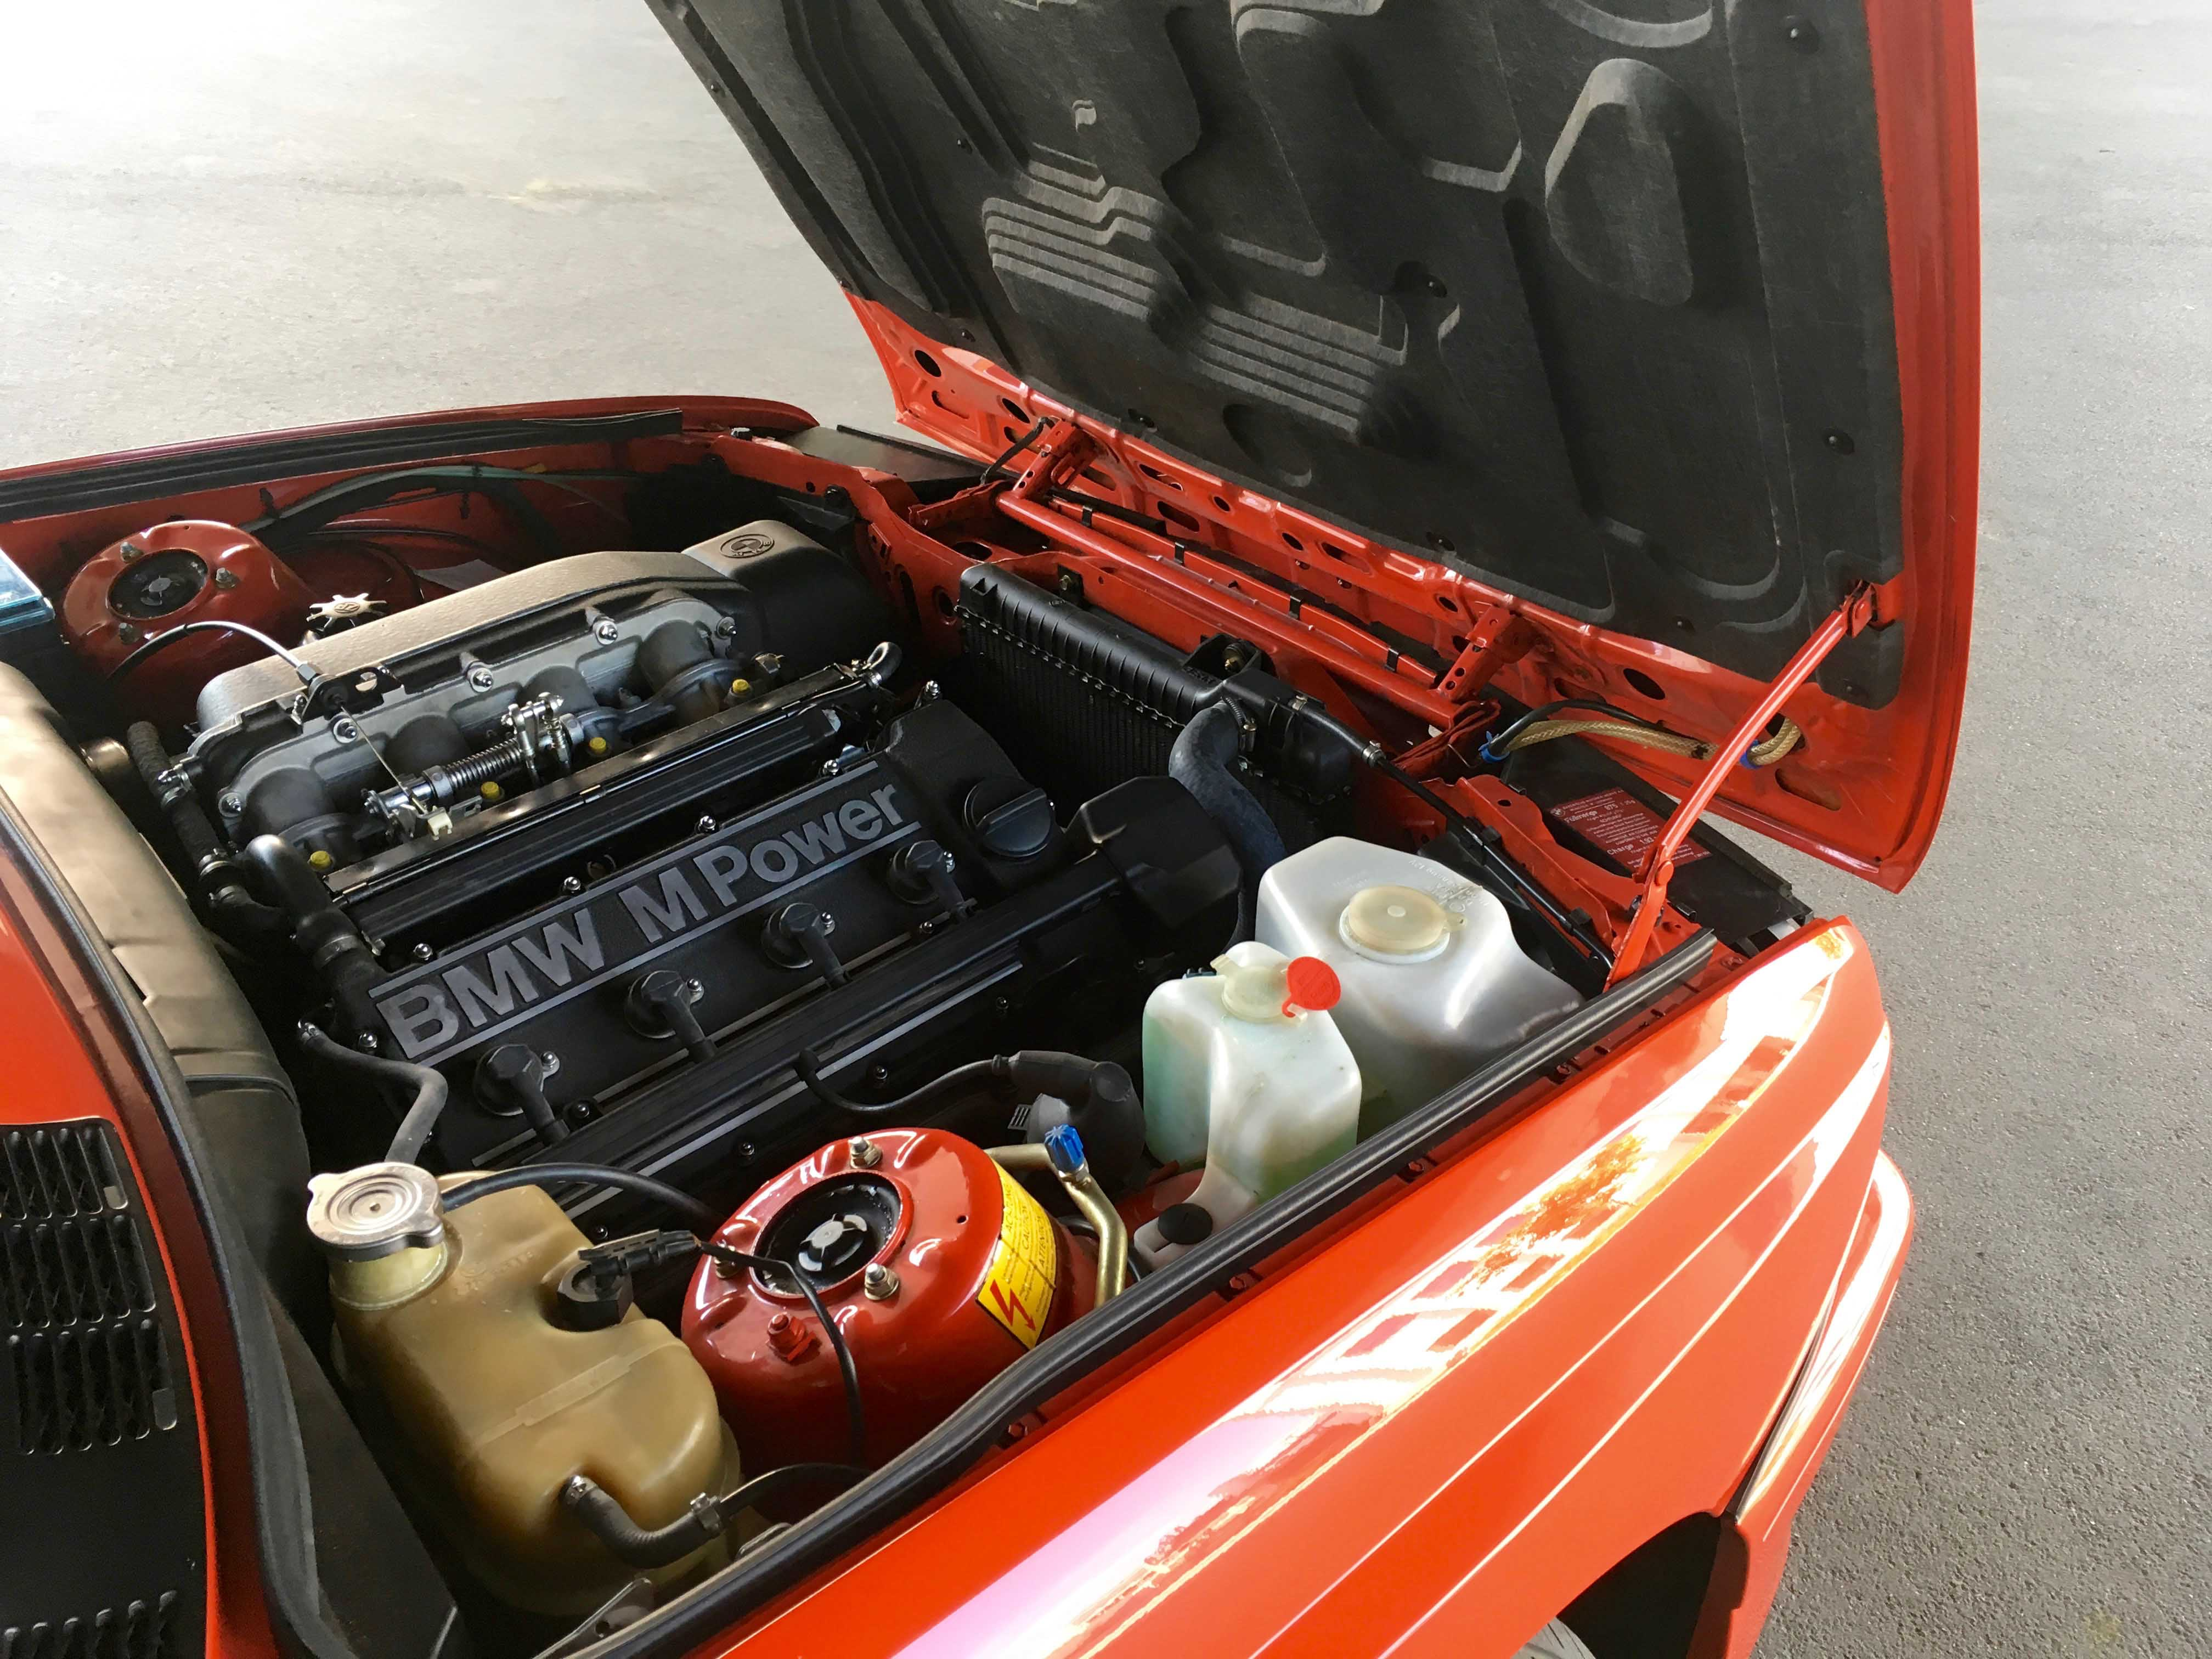 1987 BMW M3 Engine Bay hood up